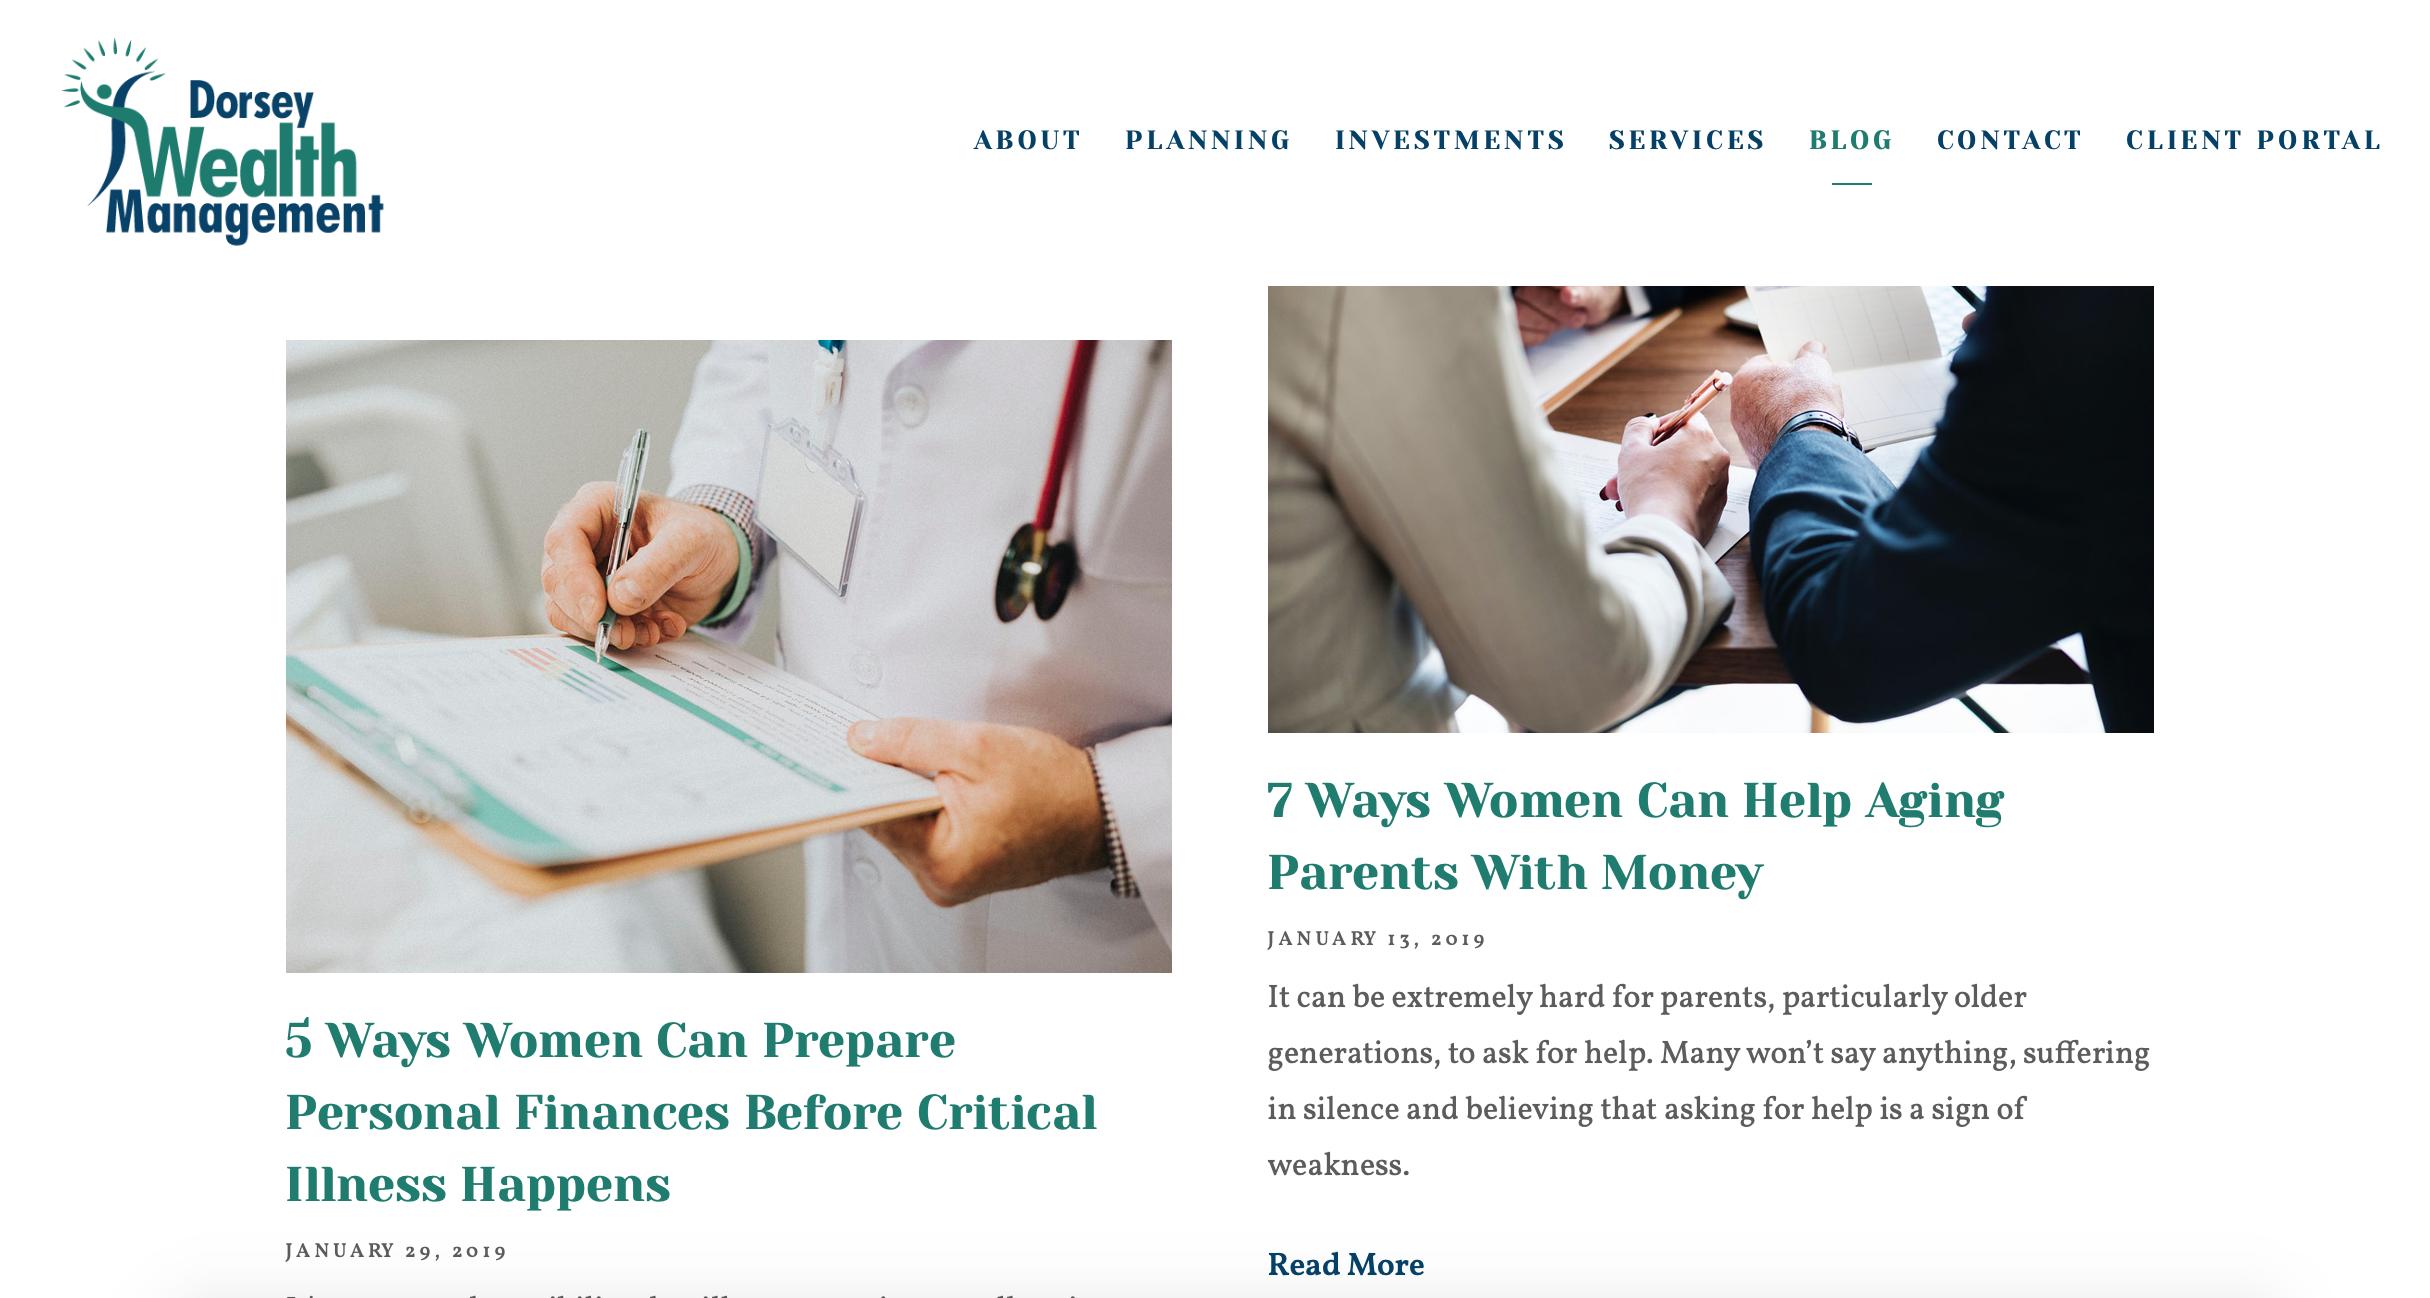 dorsey wealth management blog, financial advisor blog